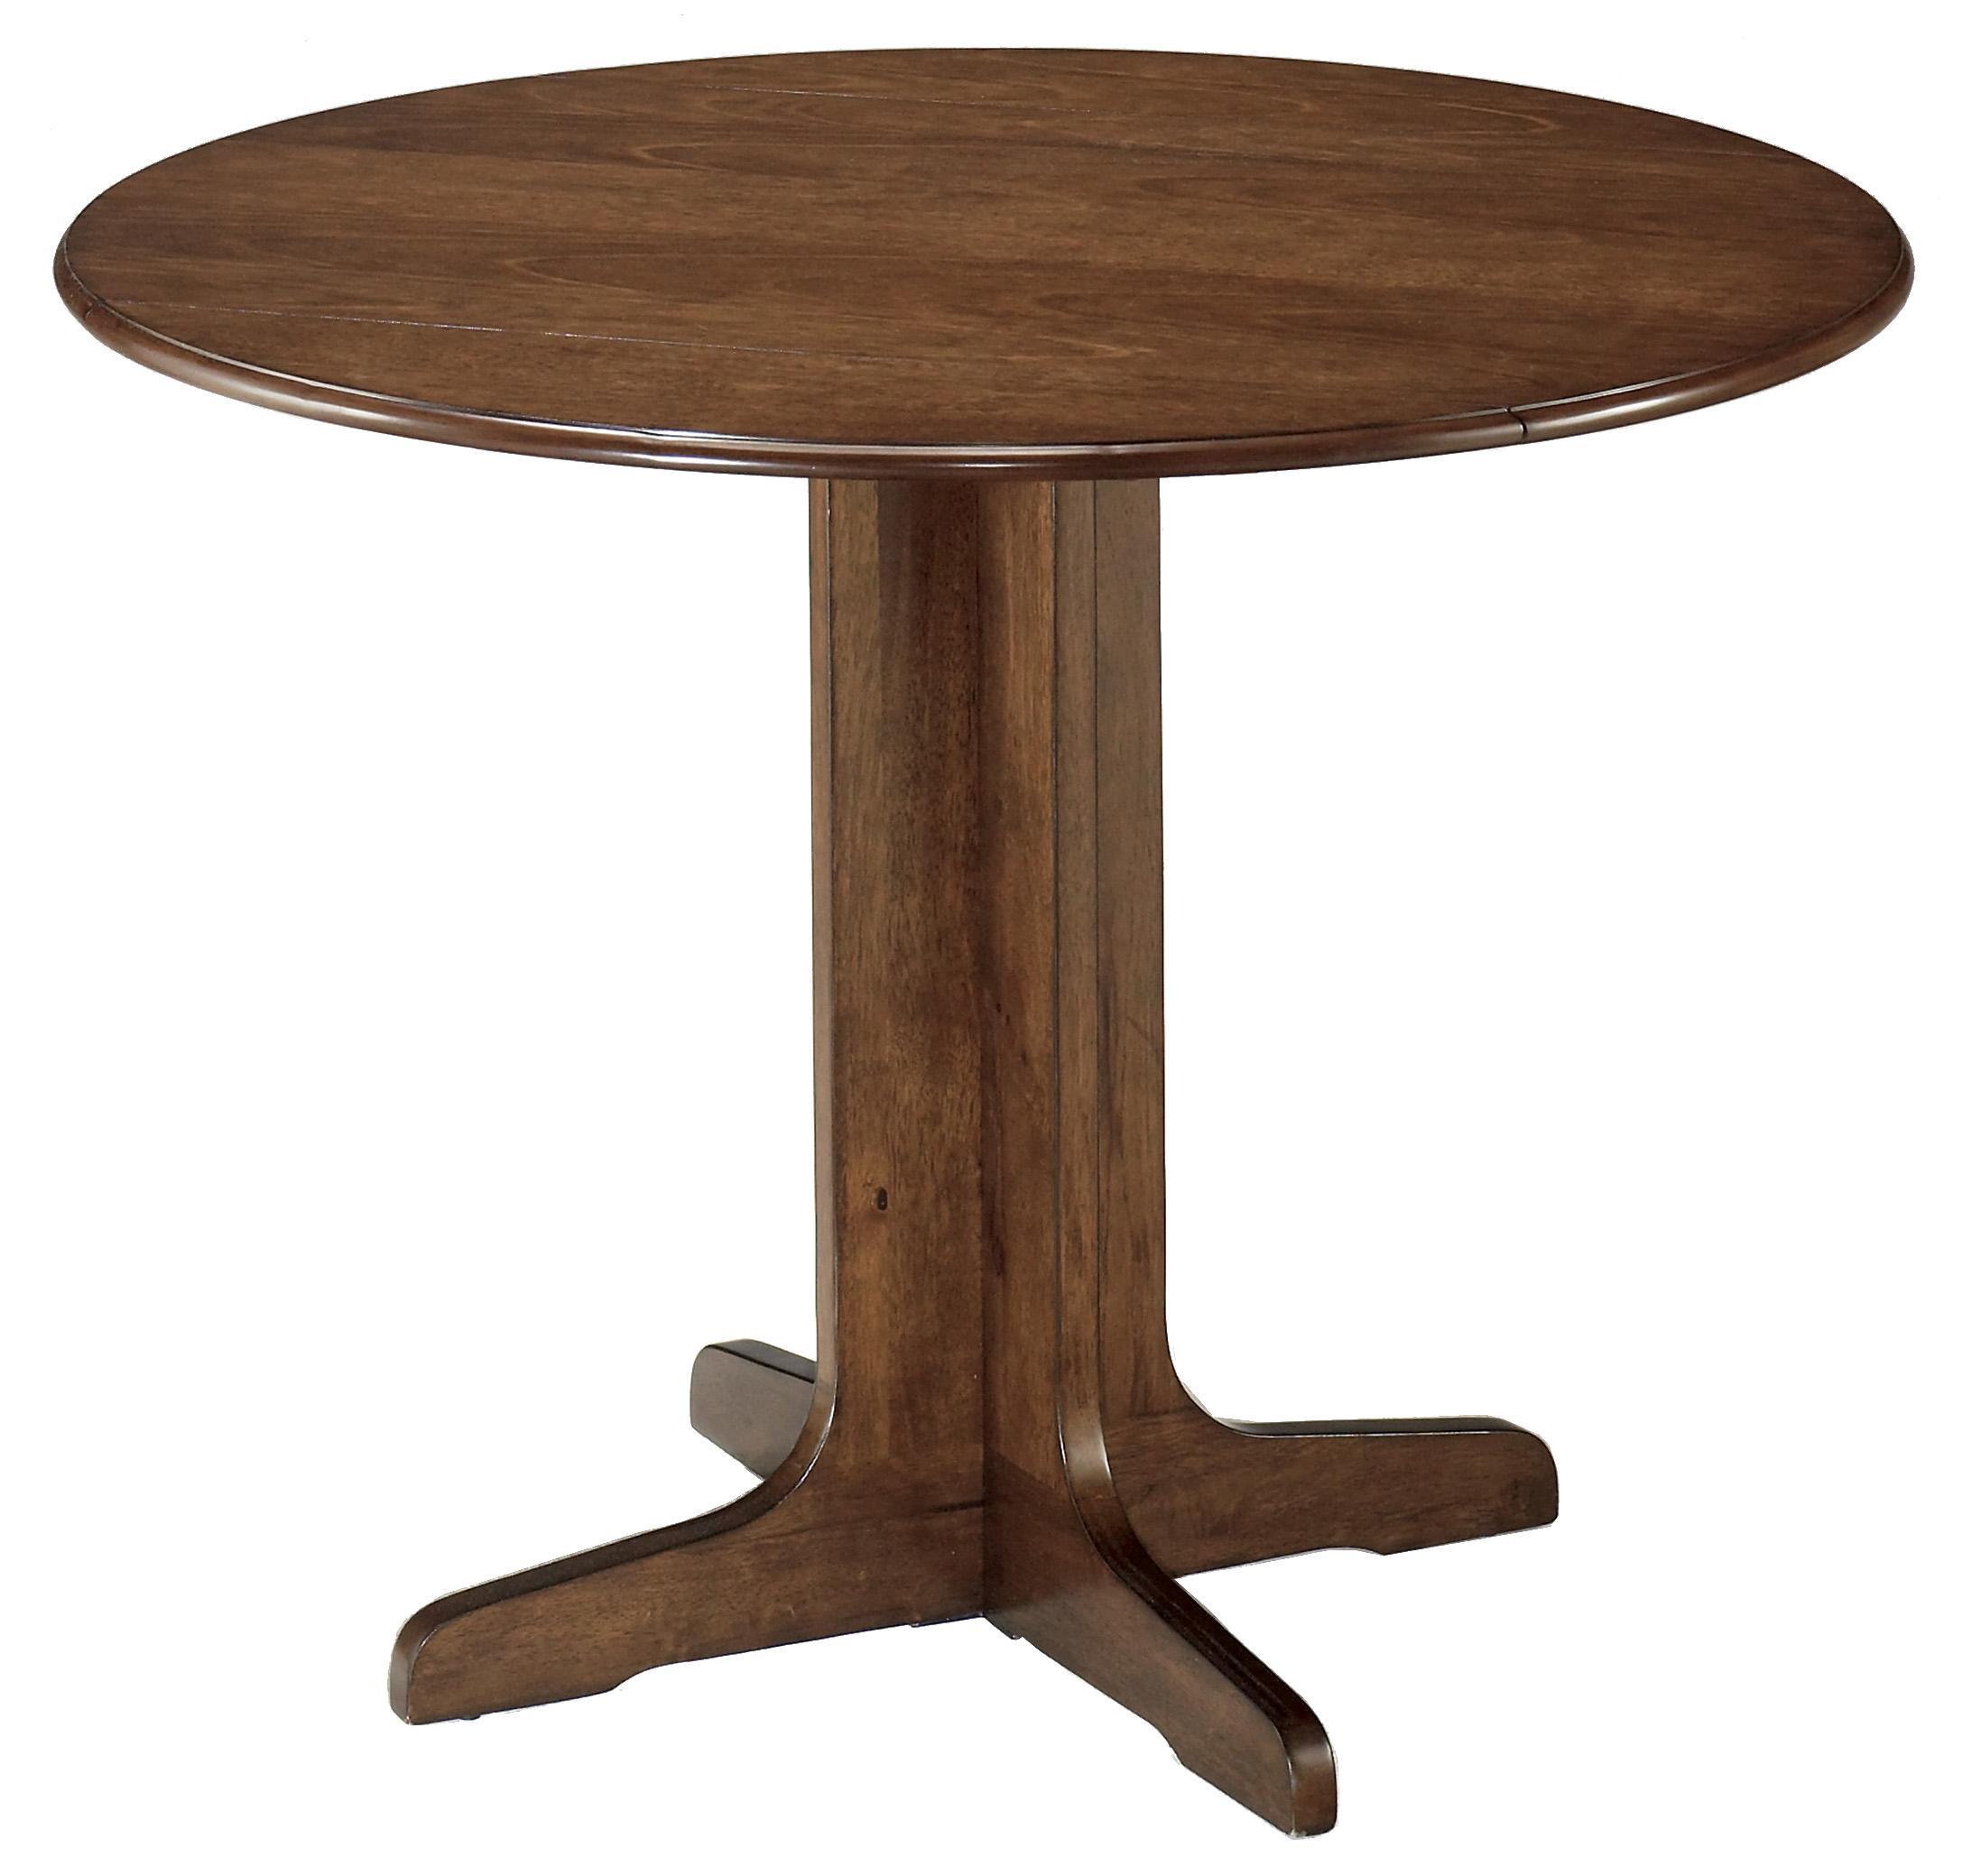 Stuman Round Drop Leaf Table by Ashley (Signature Design) at Johnny Janosik